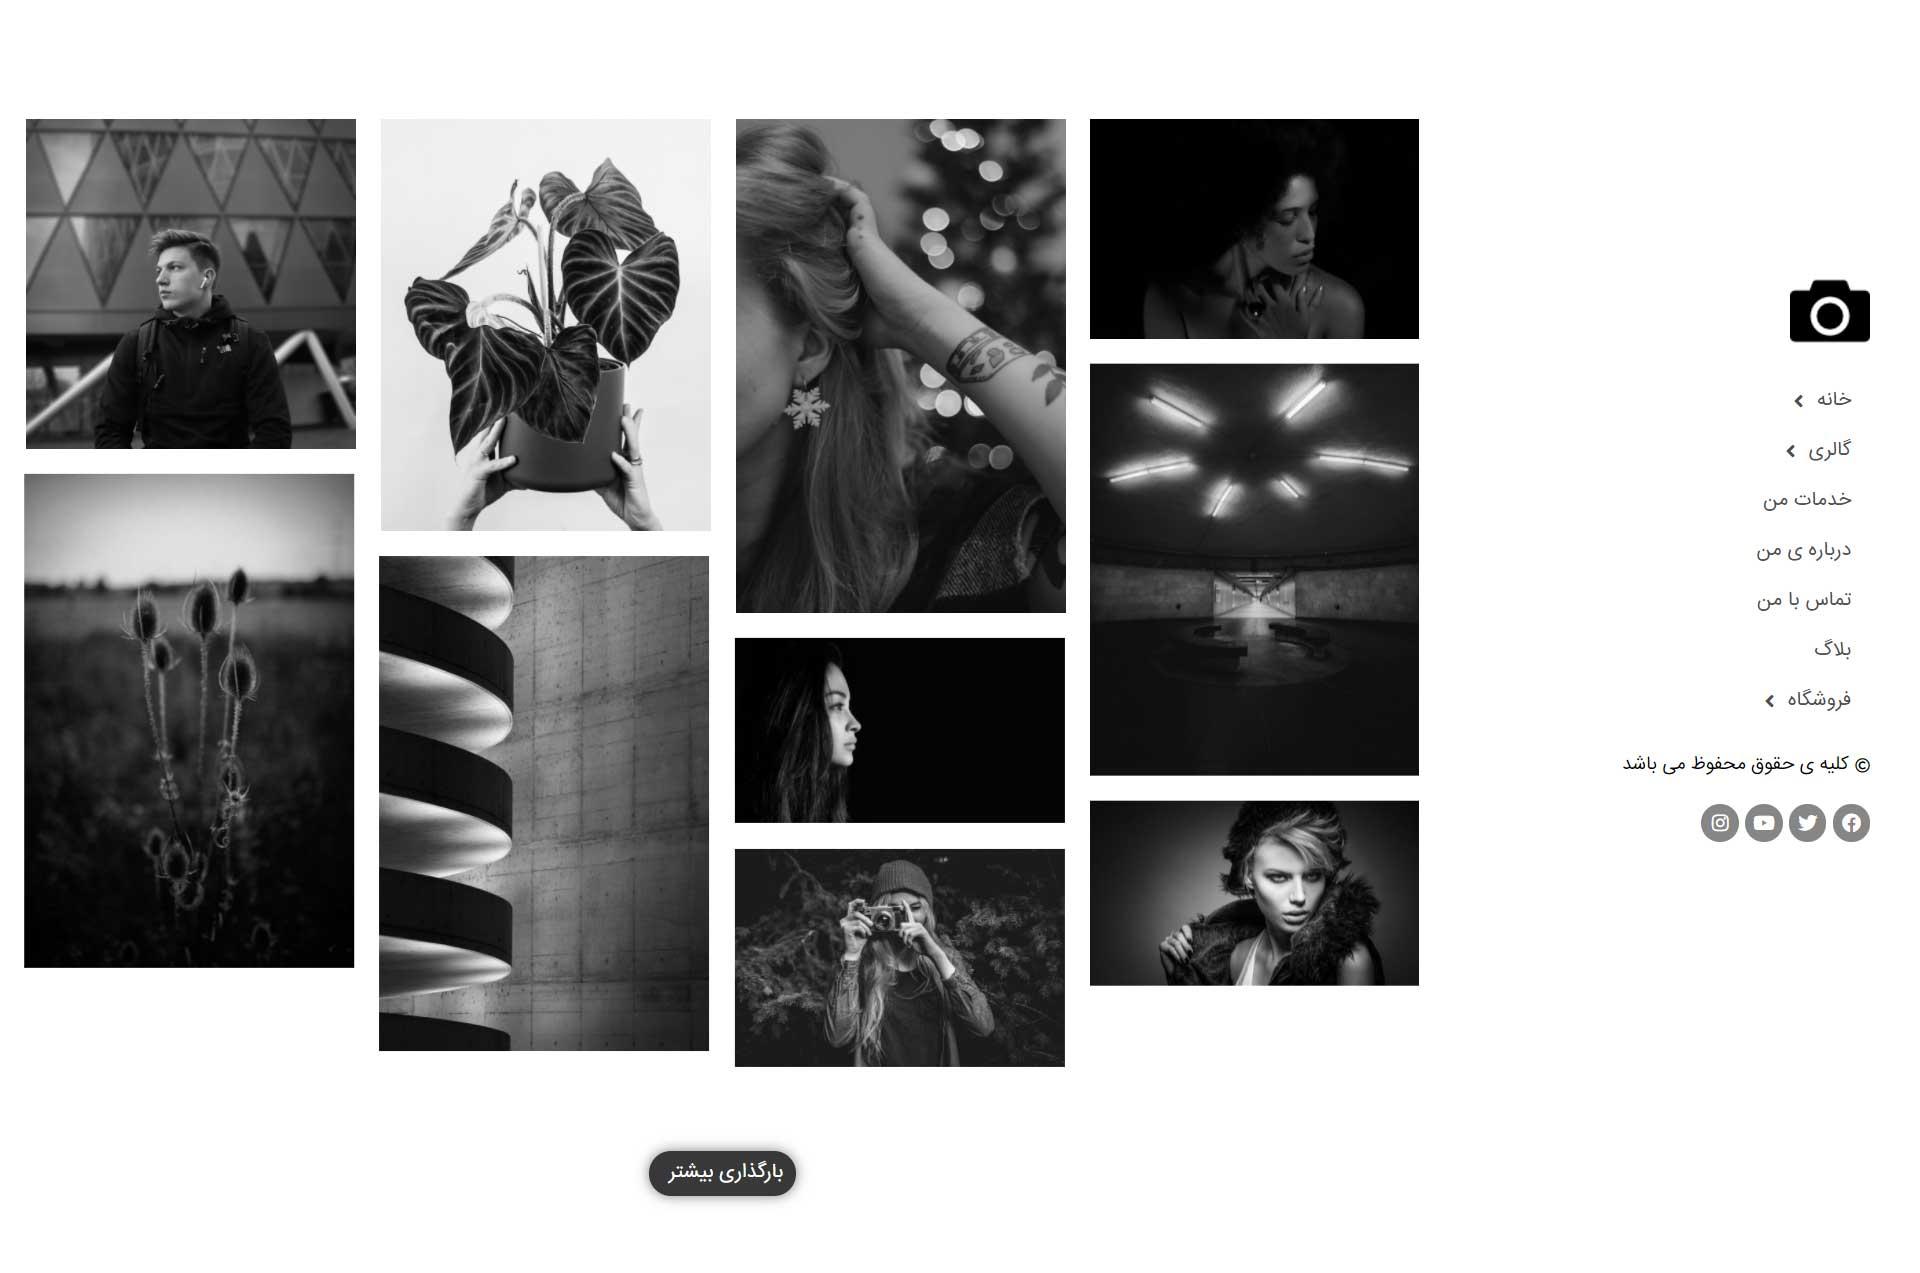 صفحات و قالب وردپرس عکاسی فوتوسین